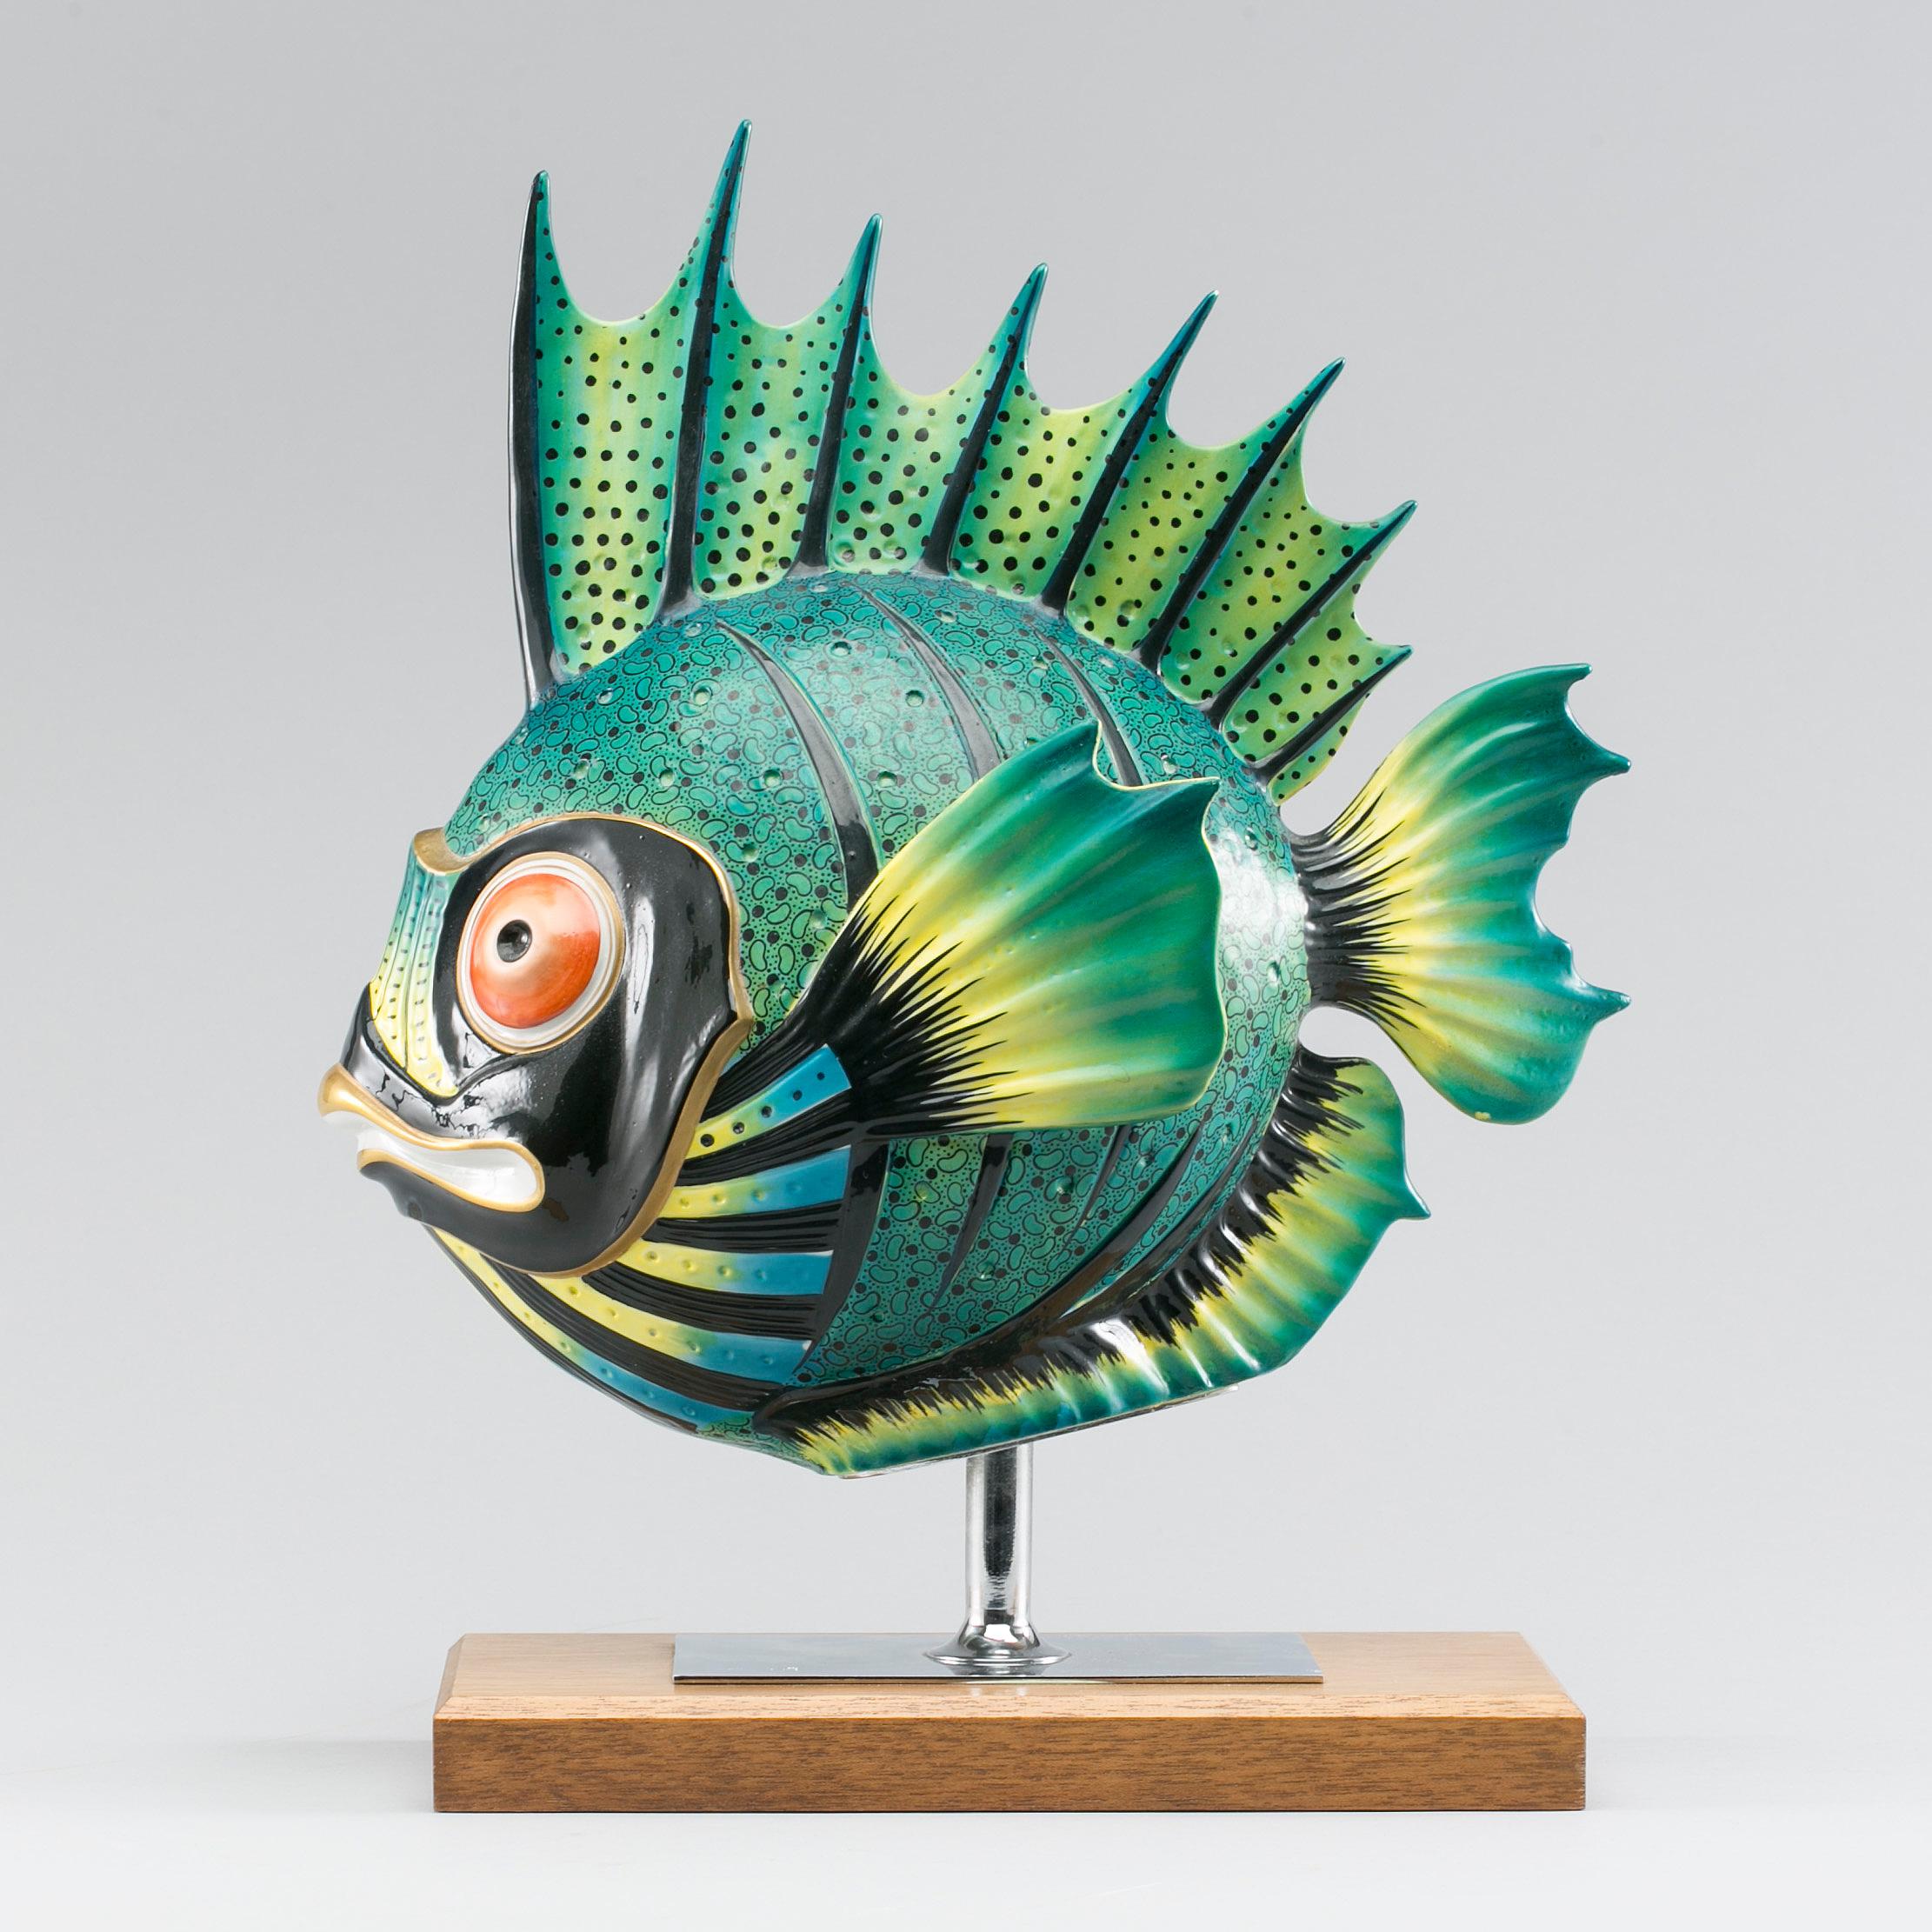 keramik fisk Auktionstipset   FISK Keramik. Italien, 1970 tal. keramik fisk